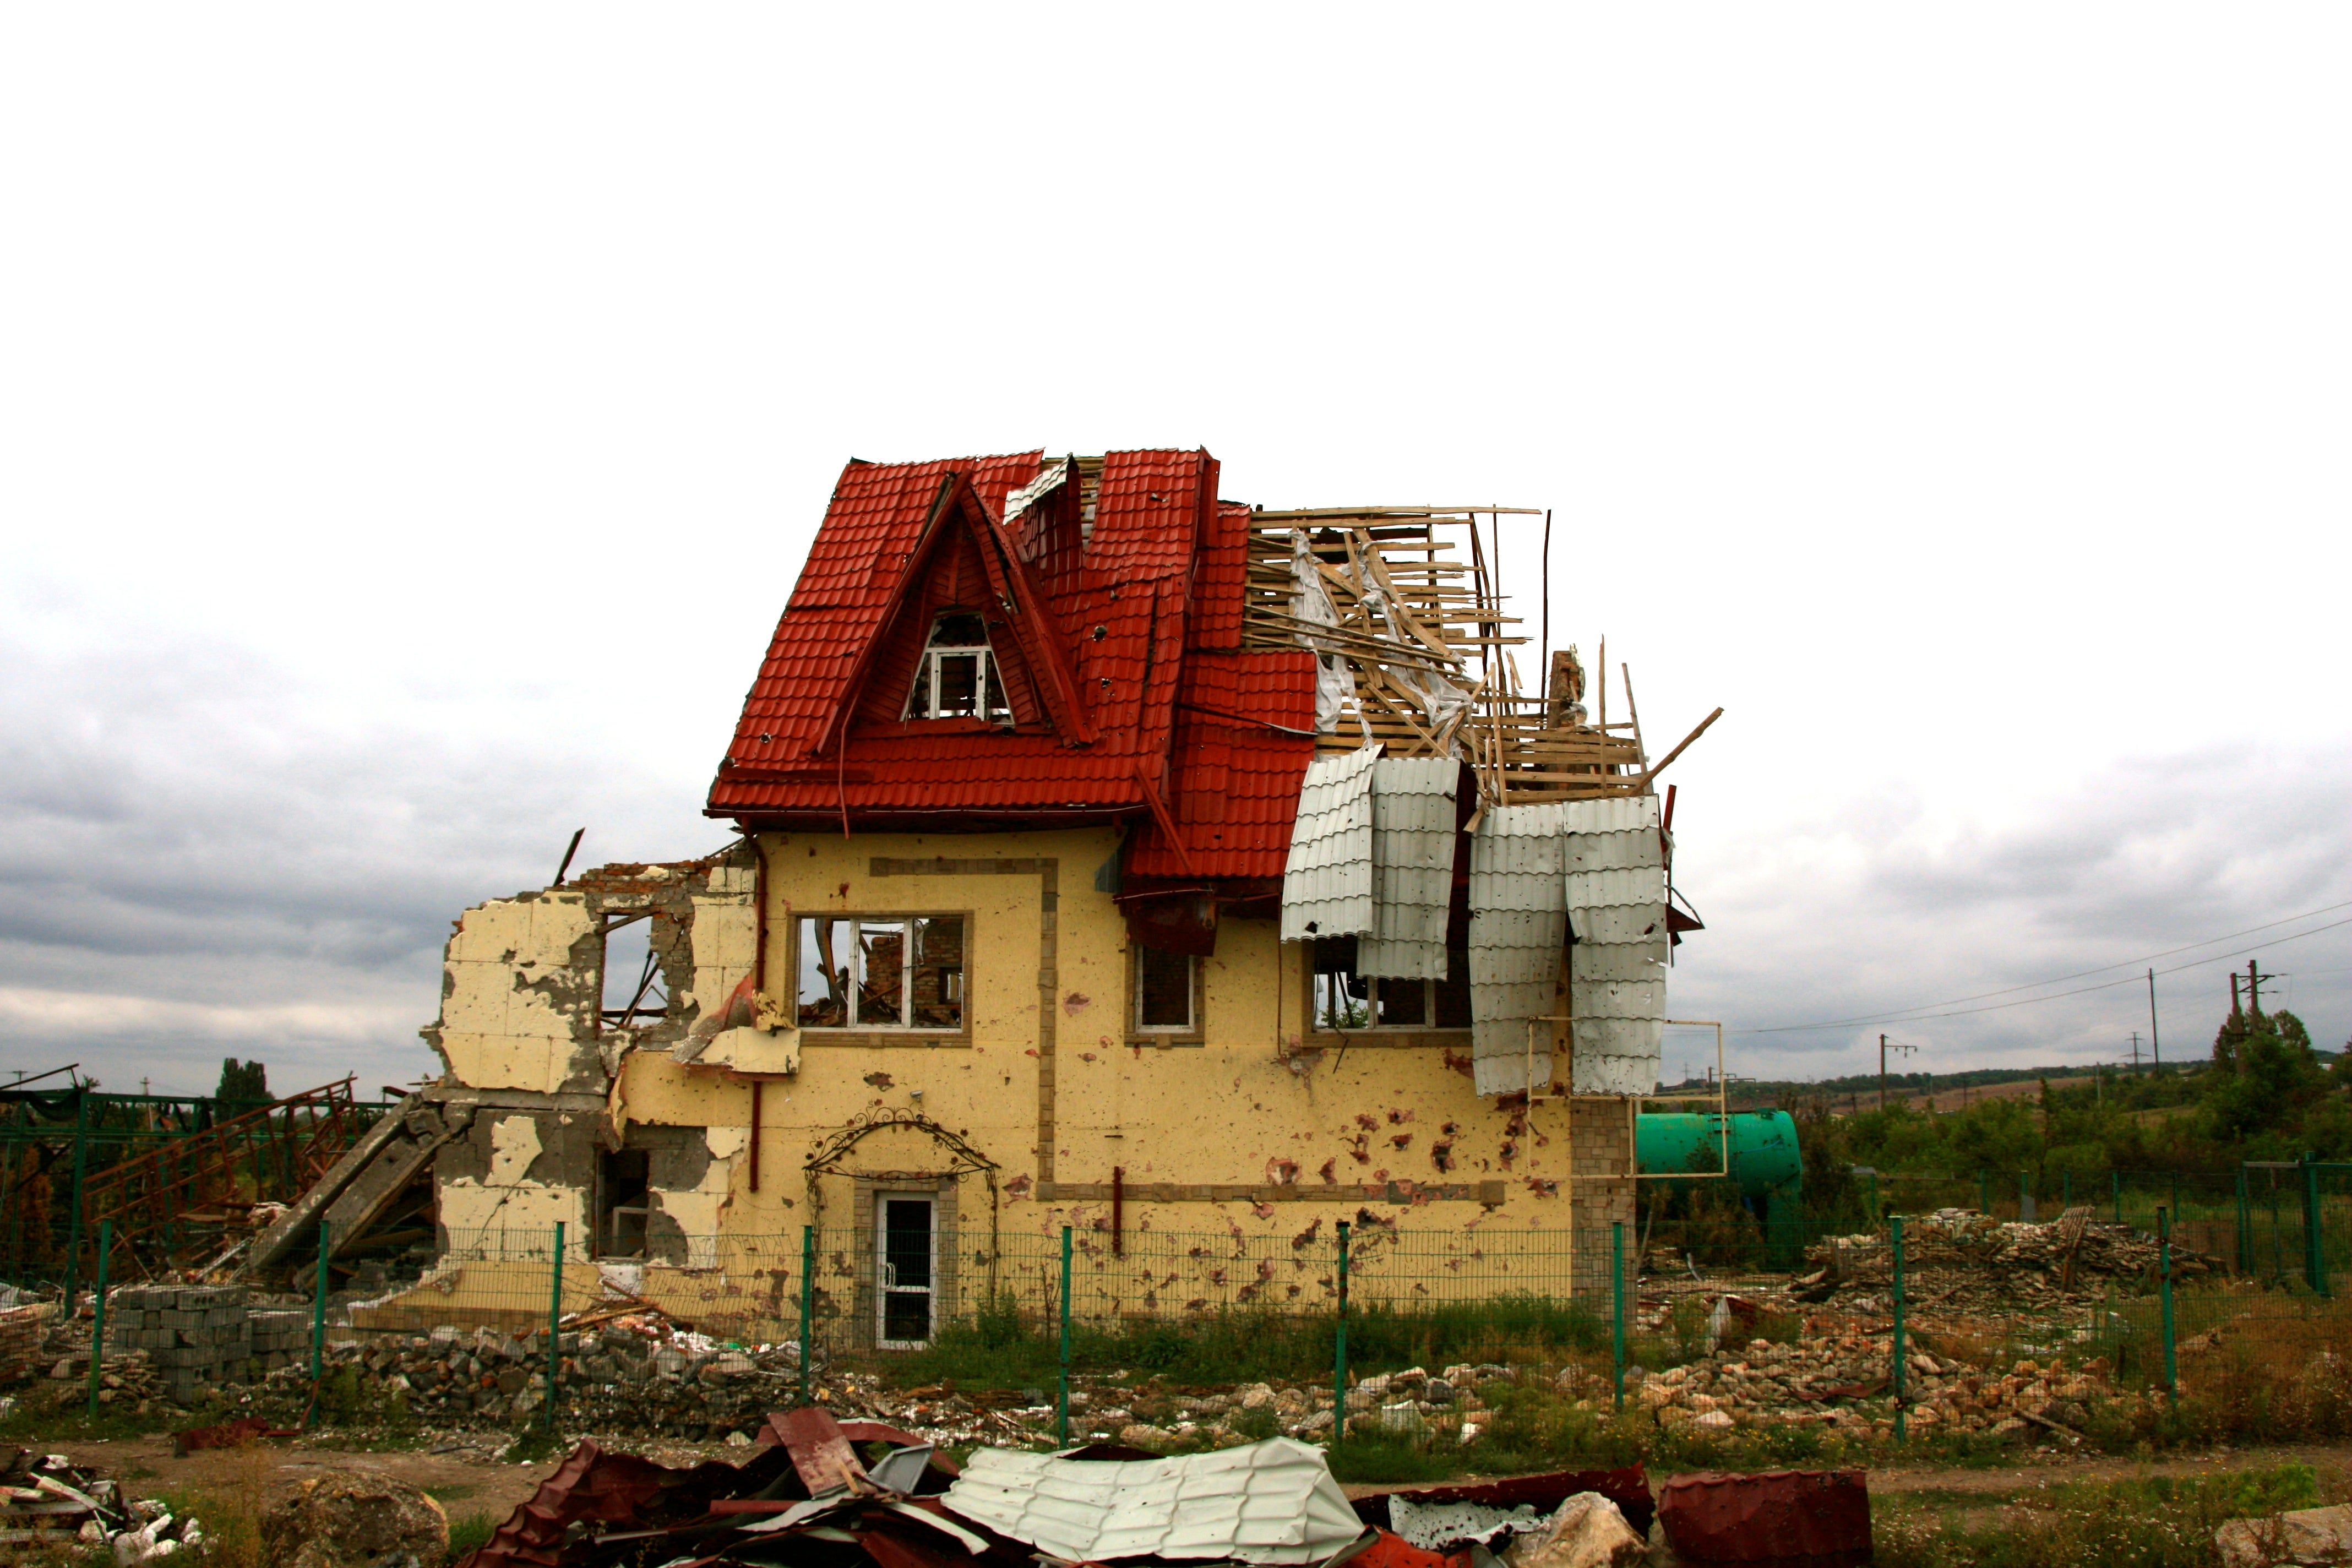 The Ukraine war has destroyed villages along the 200-mile-long front line.